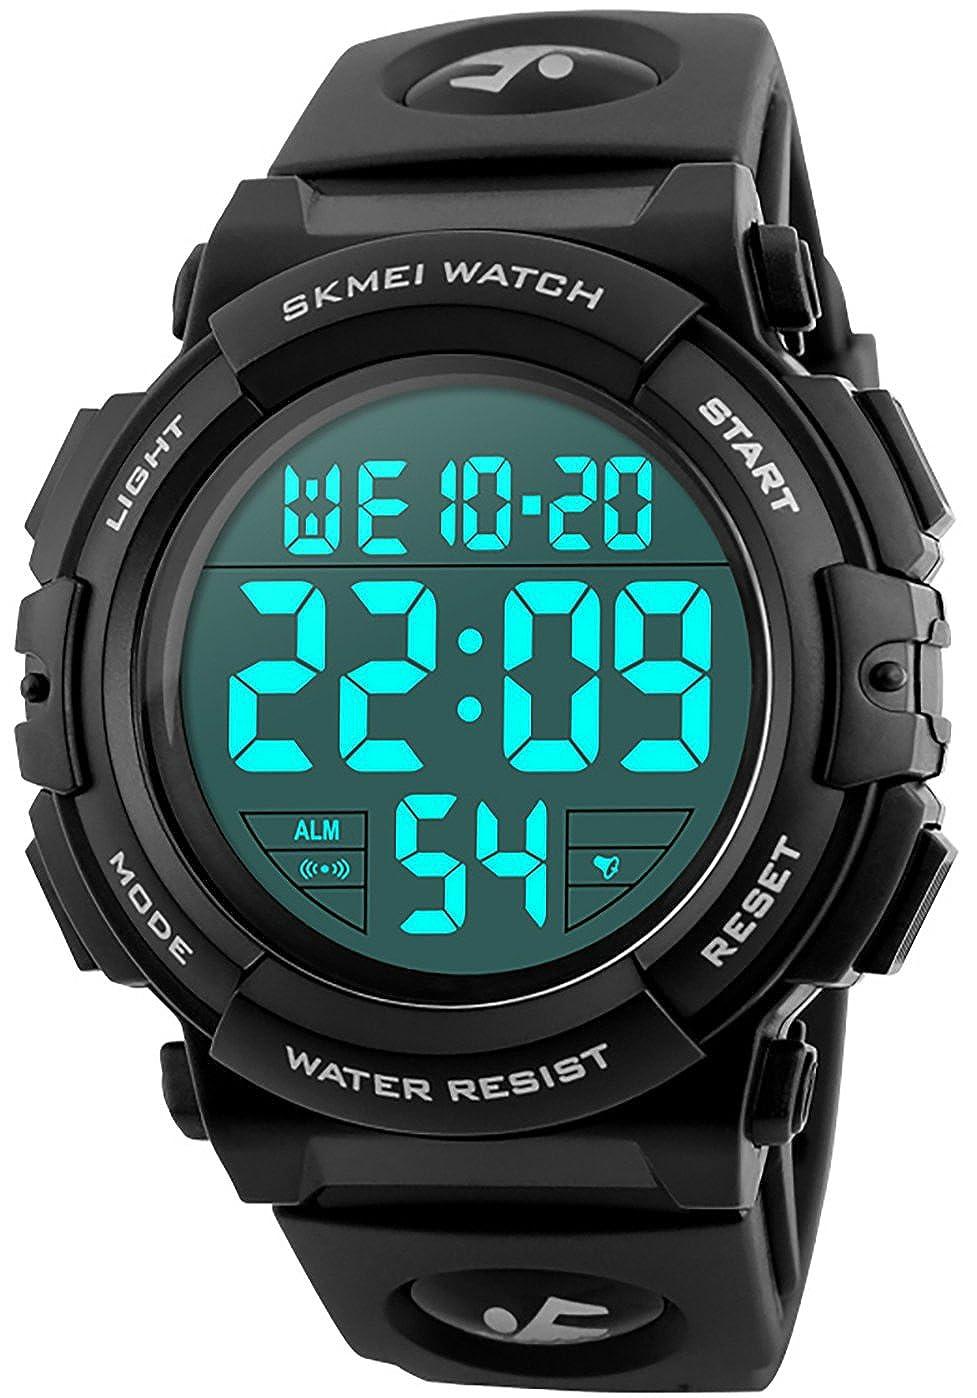 Dual-display-uhren Mode Marke Männer Military Digitale Datum Countdown-timer Quarz Led Armbanduhr Sport Ourdoor Gummi Armbanduhren Männlich Uhr Herrenuhren